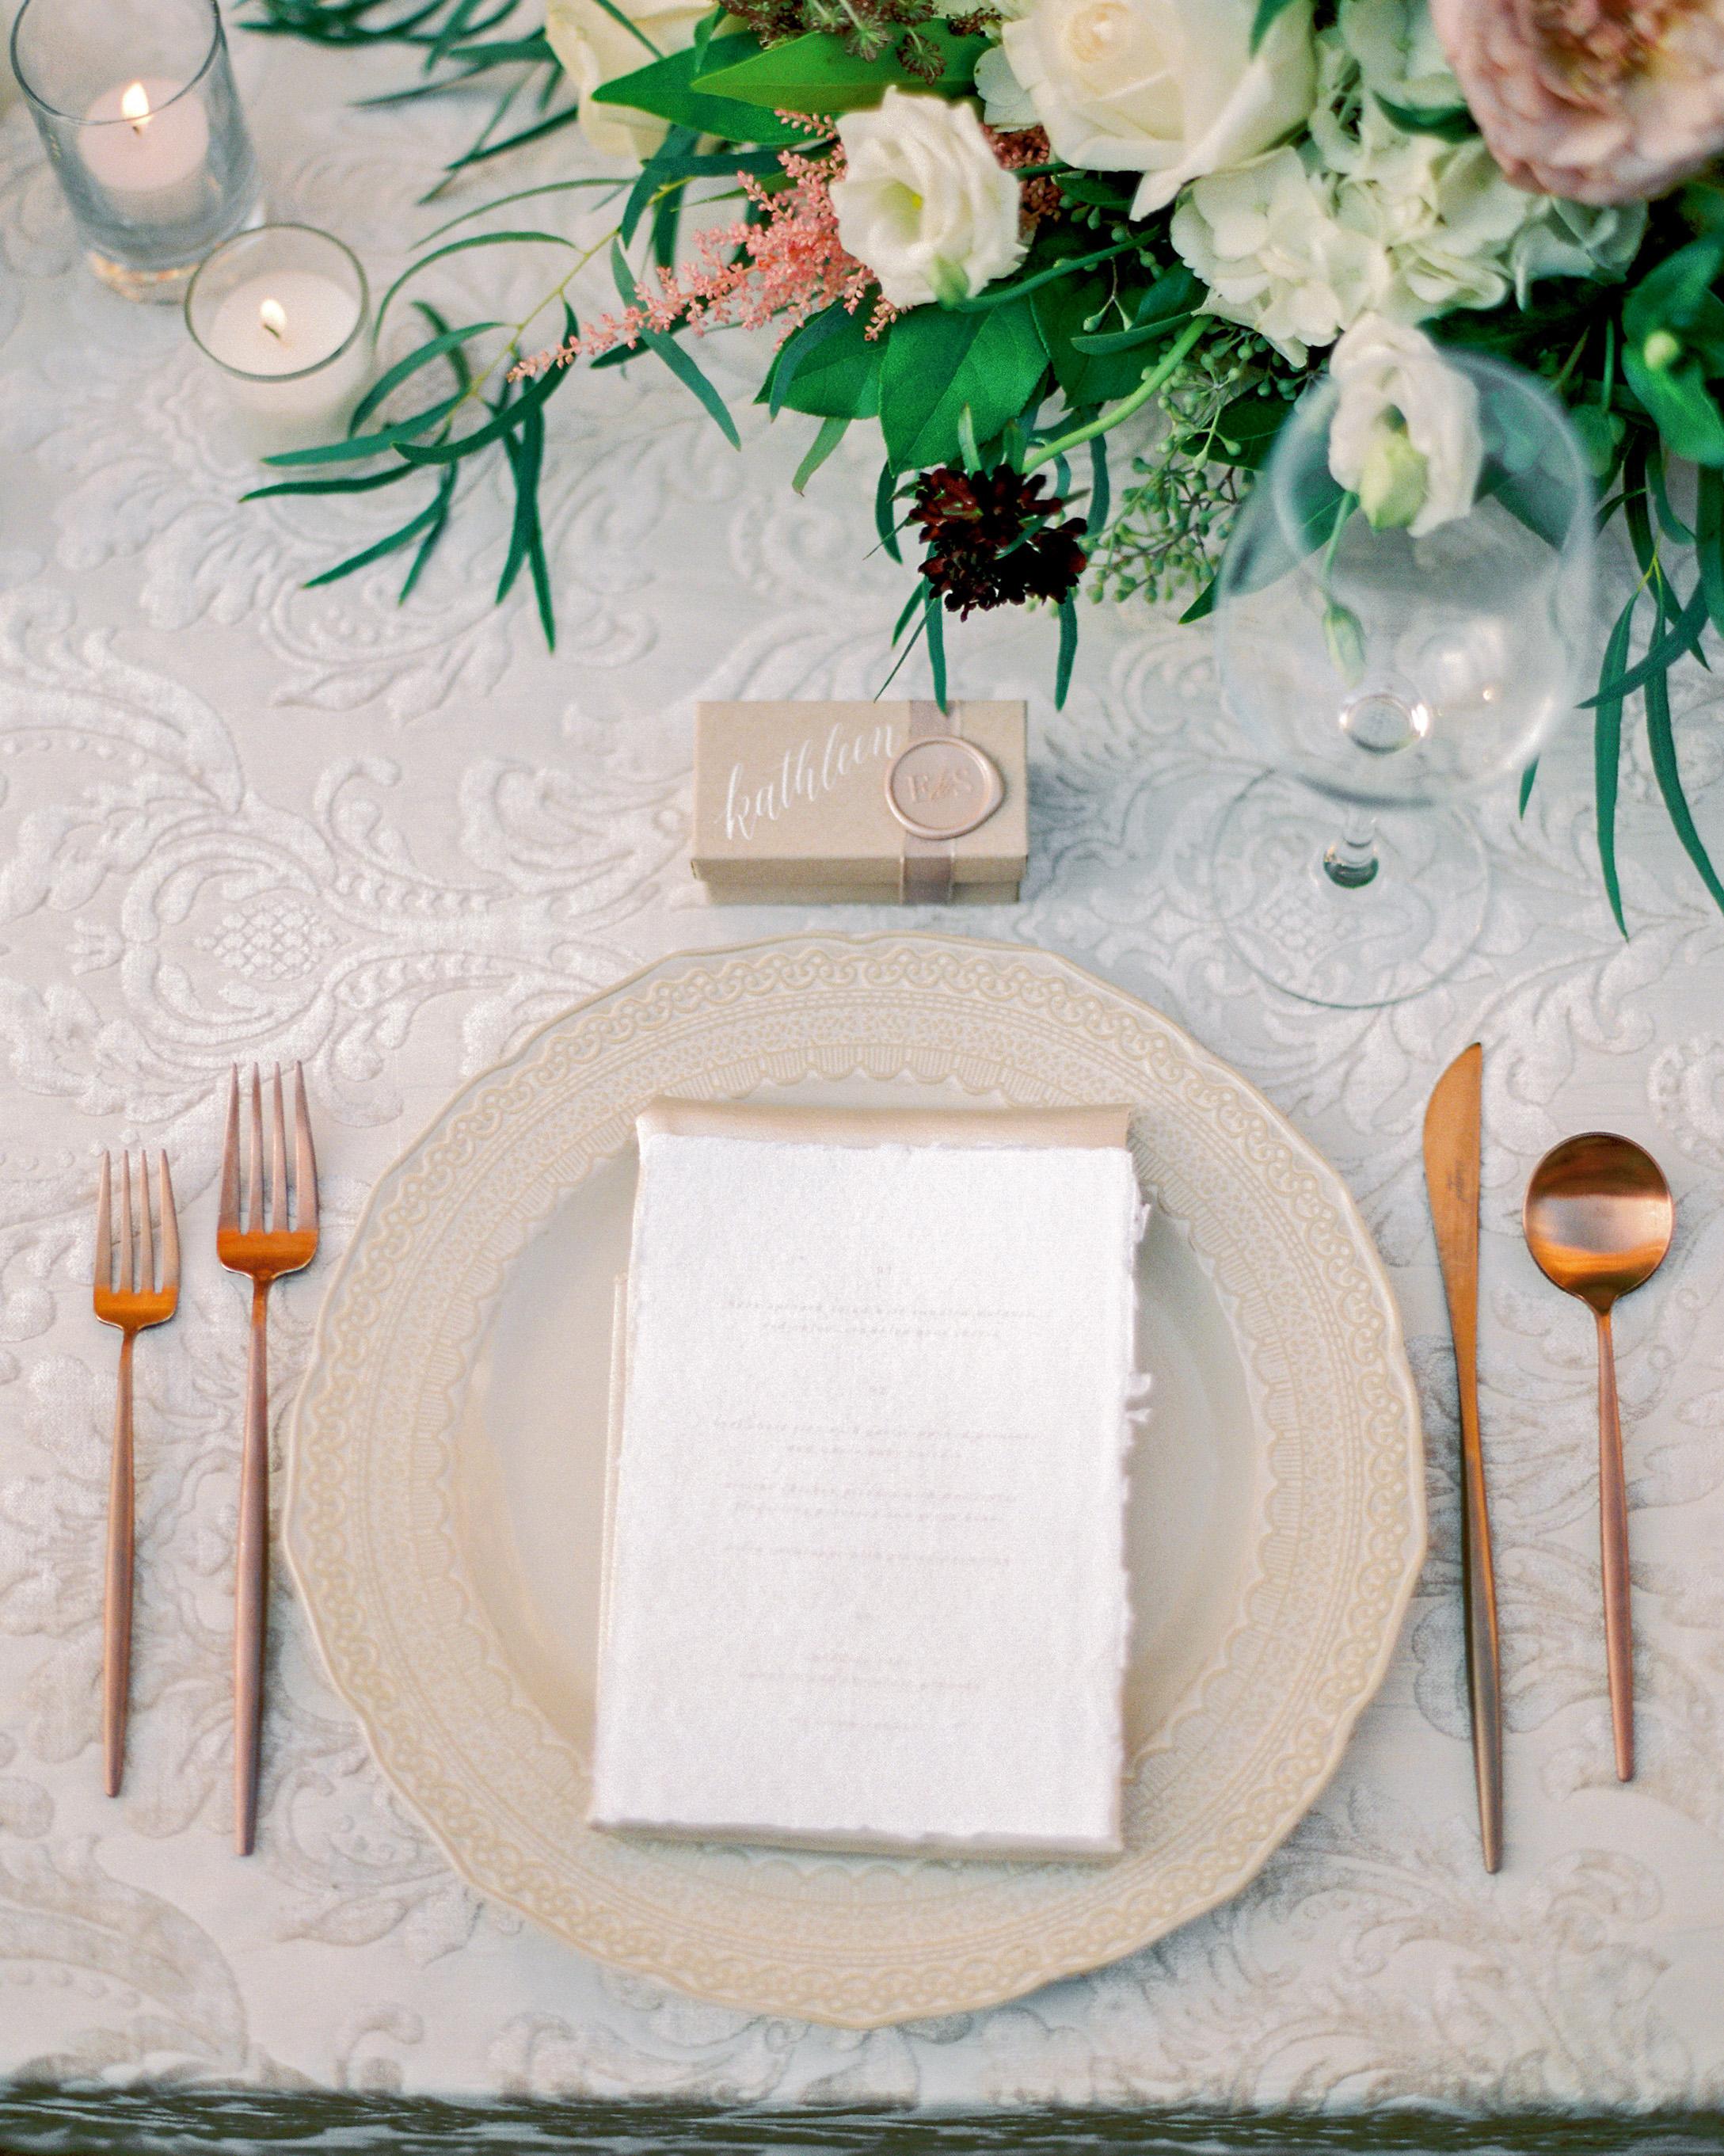 bas relief tablecloth neutral tablescape